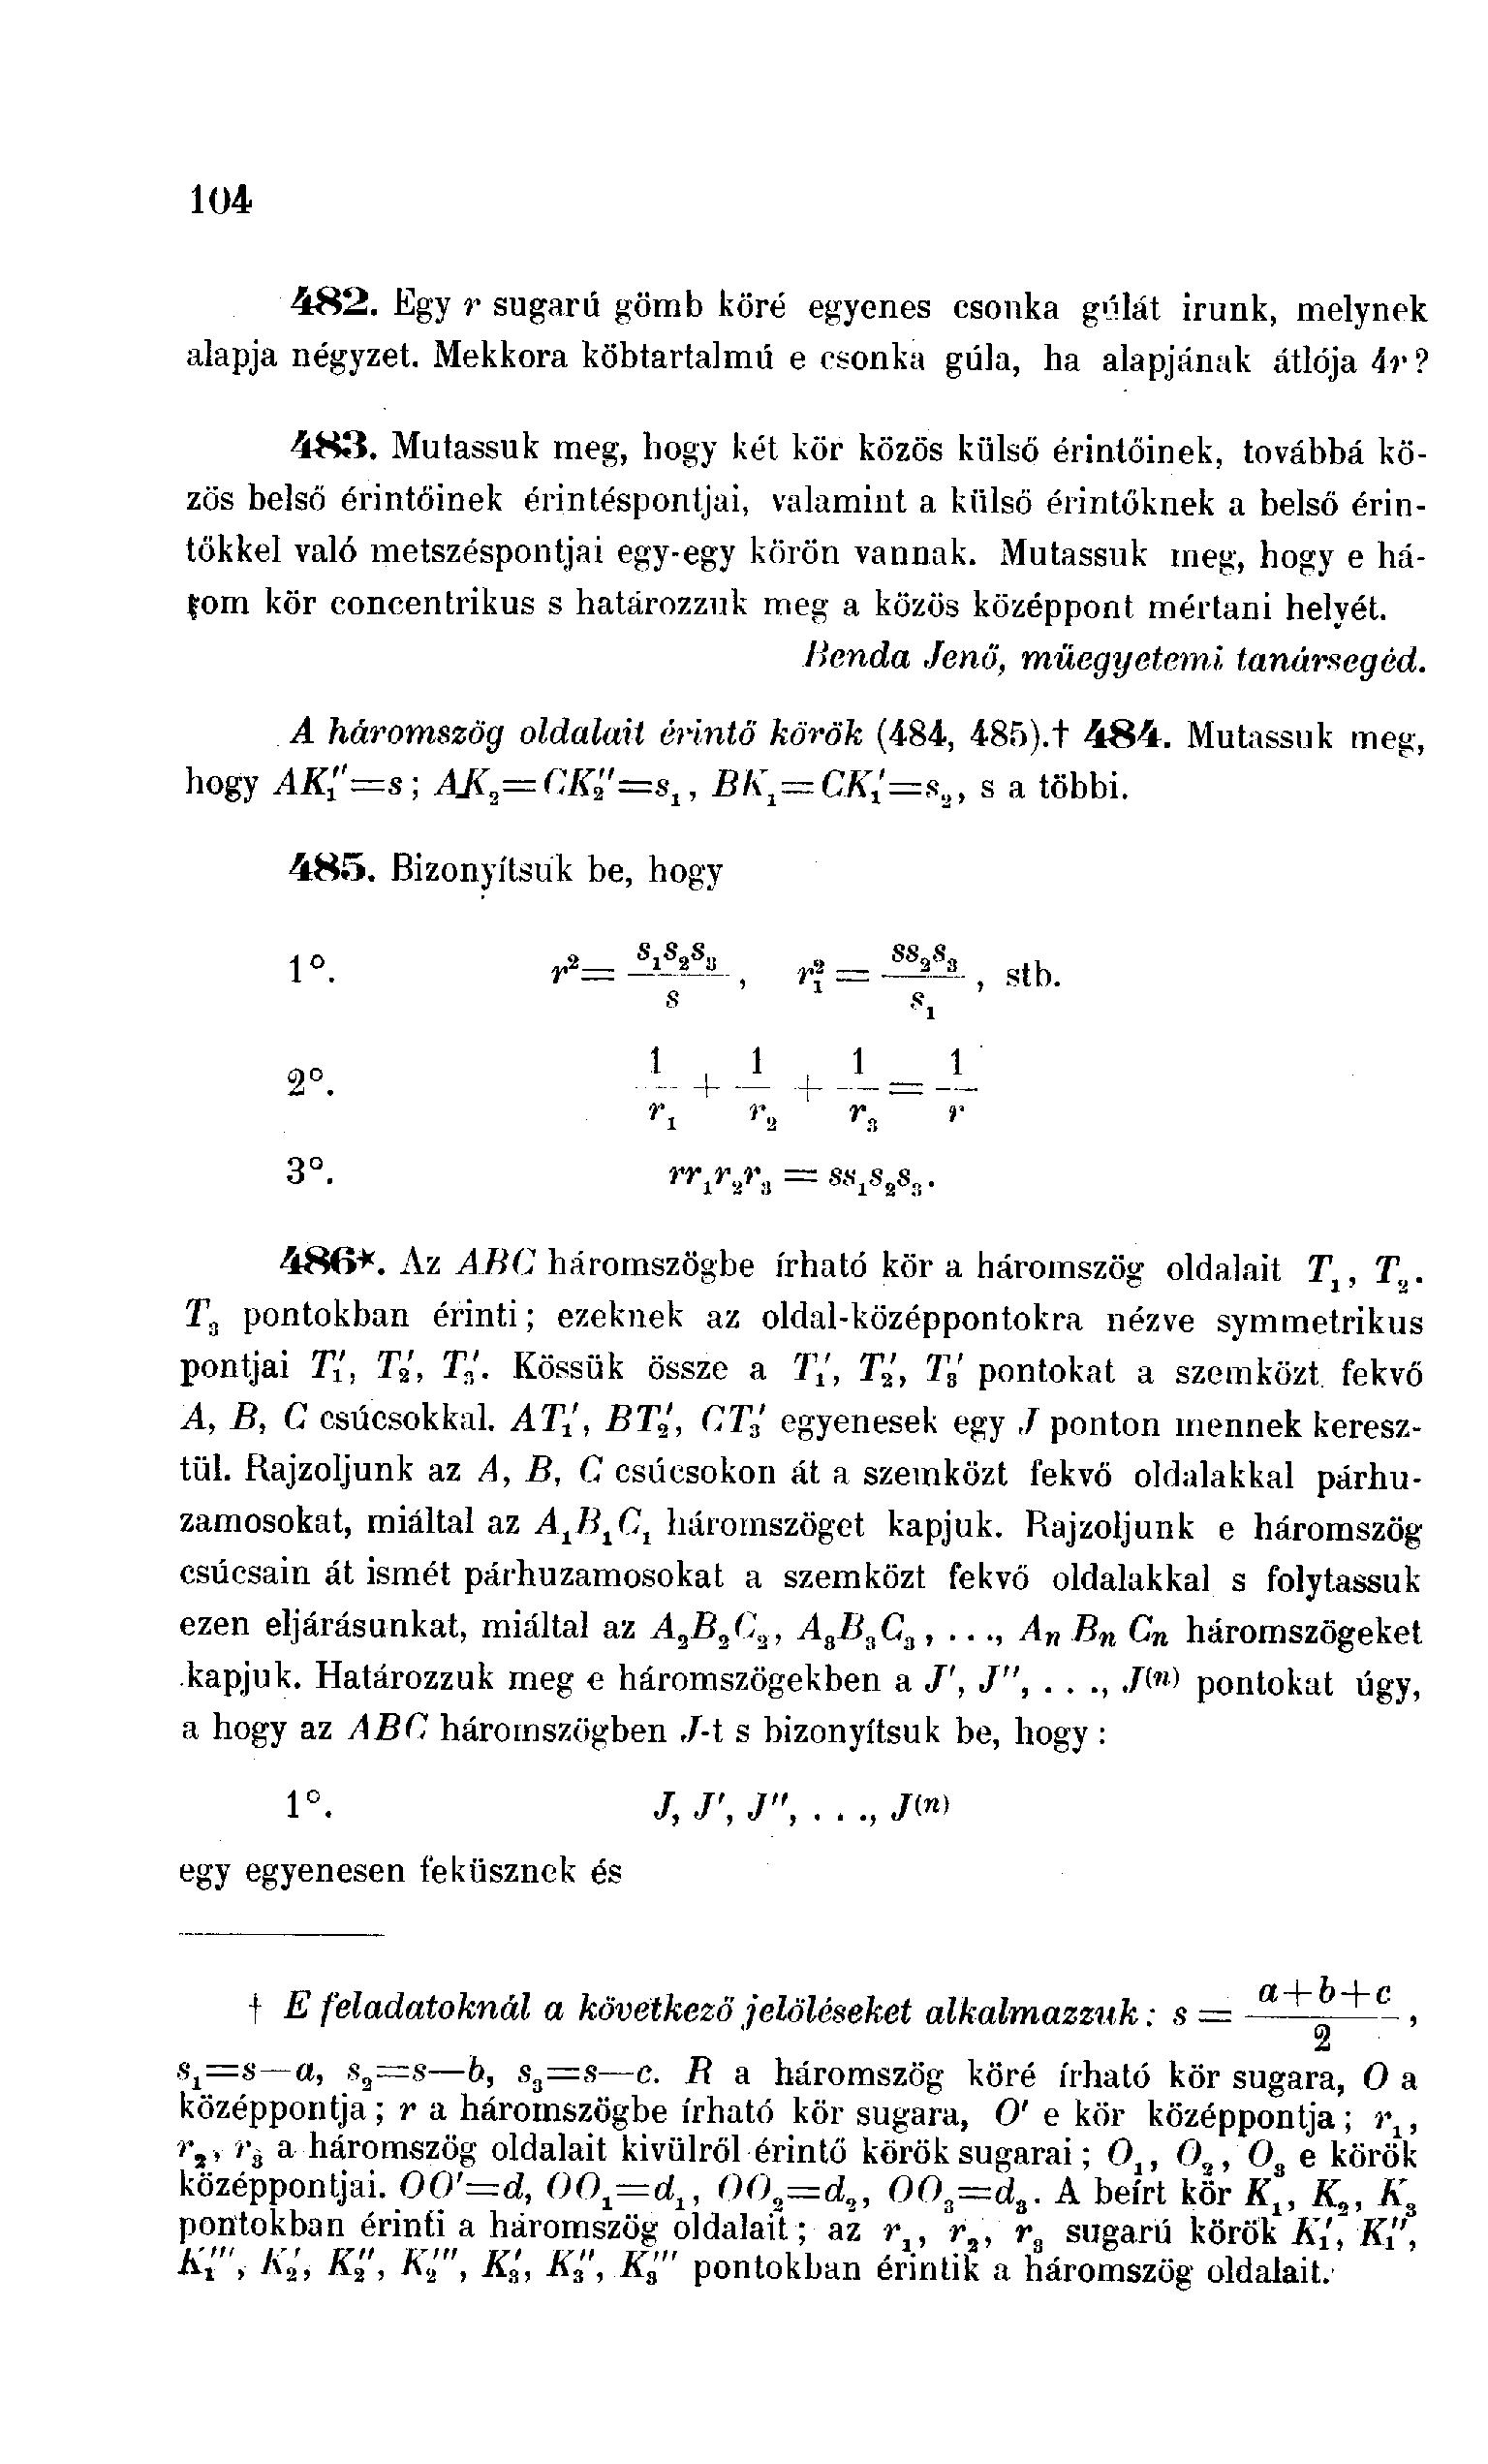 csonka gúla angolul